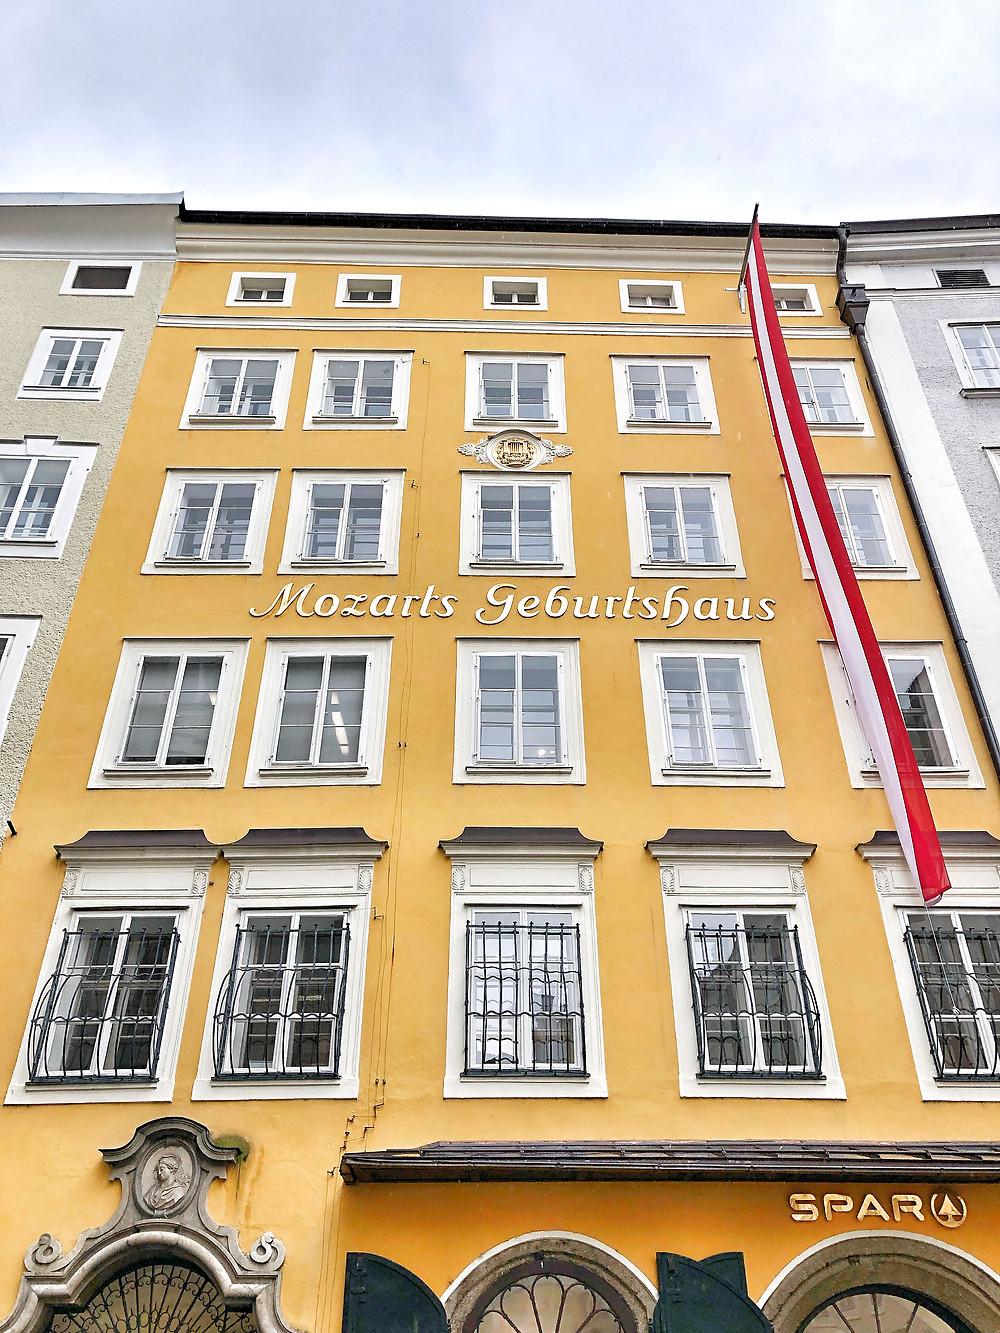 Mozart's Birthplace Salzburg